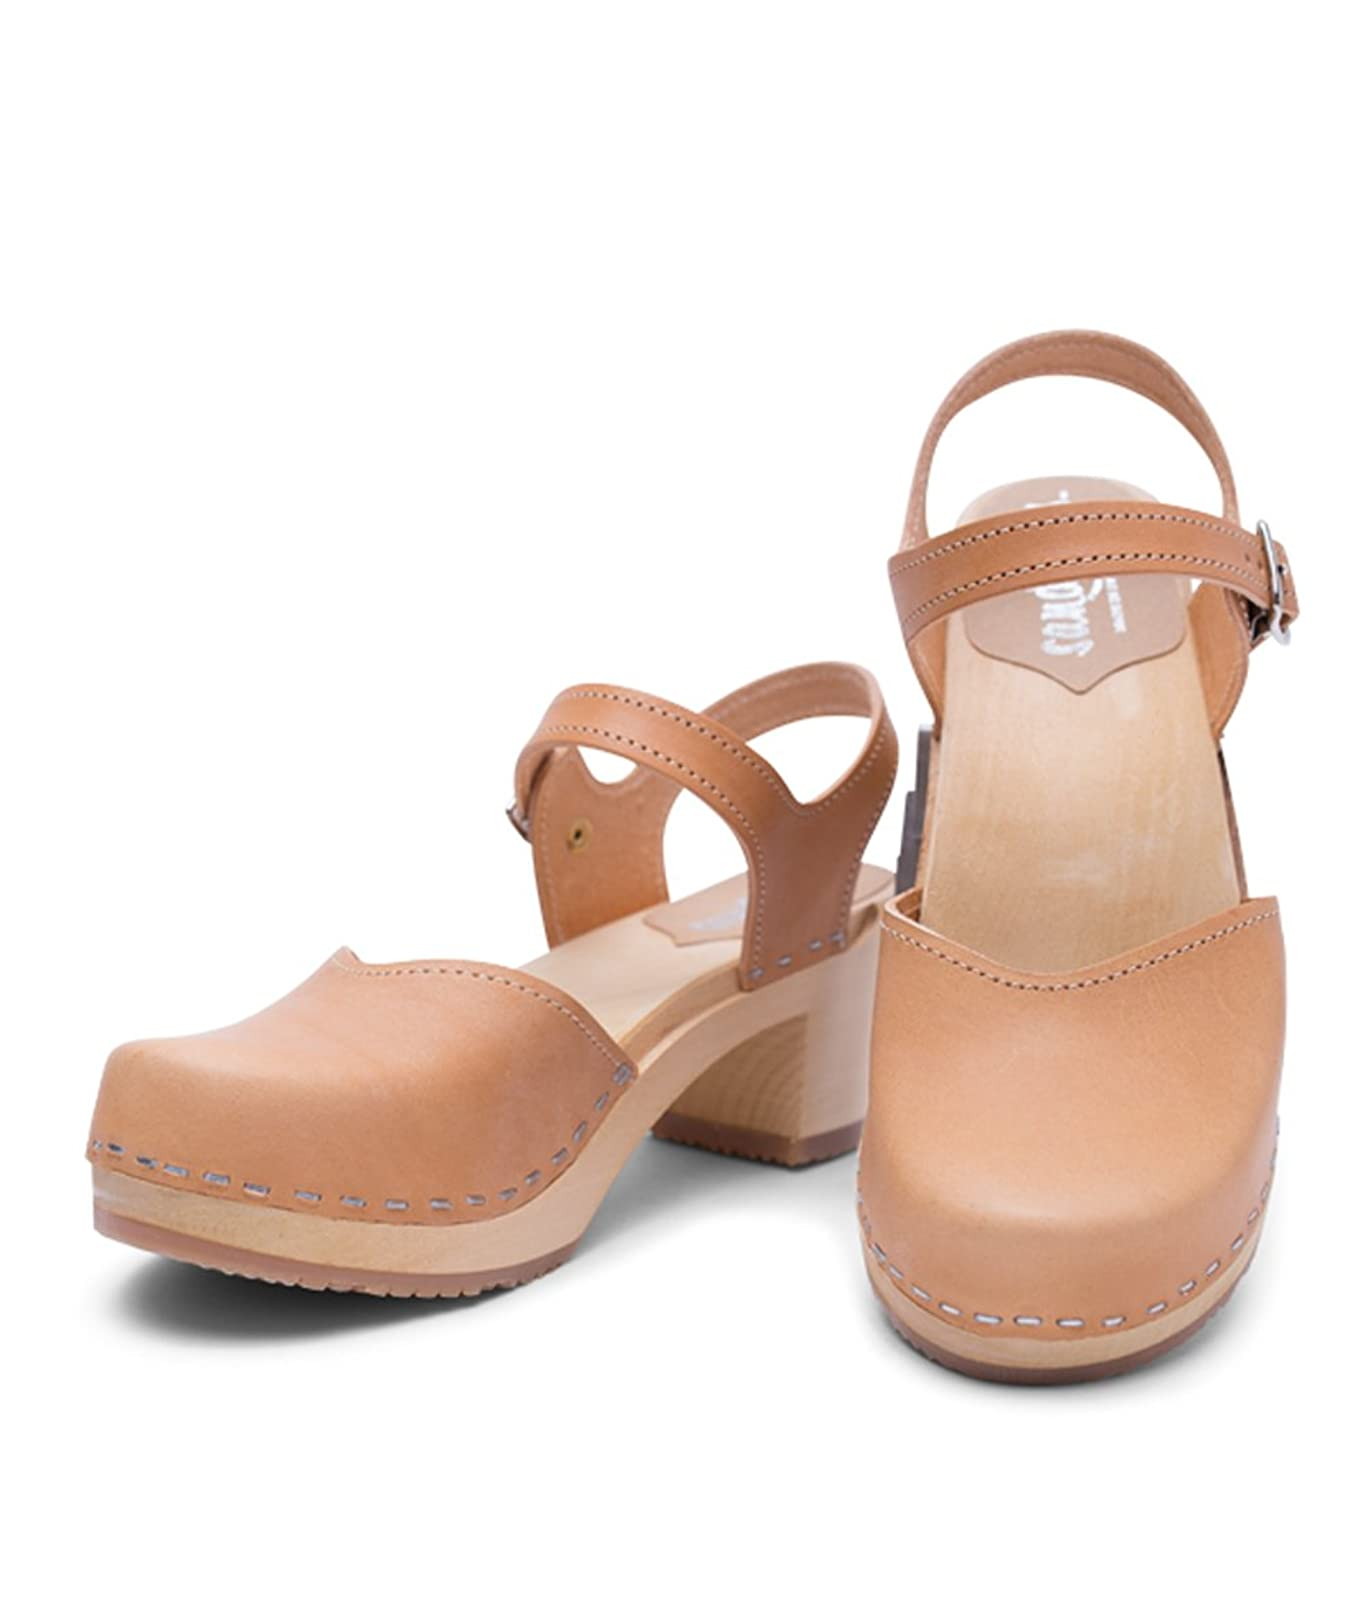 Sandgrens Swedish Wooden High Heel Clog Sandals - 2